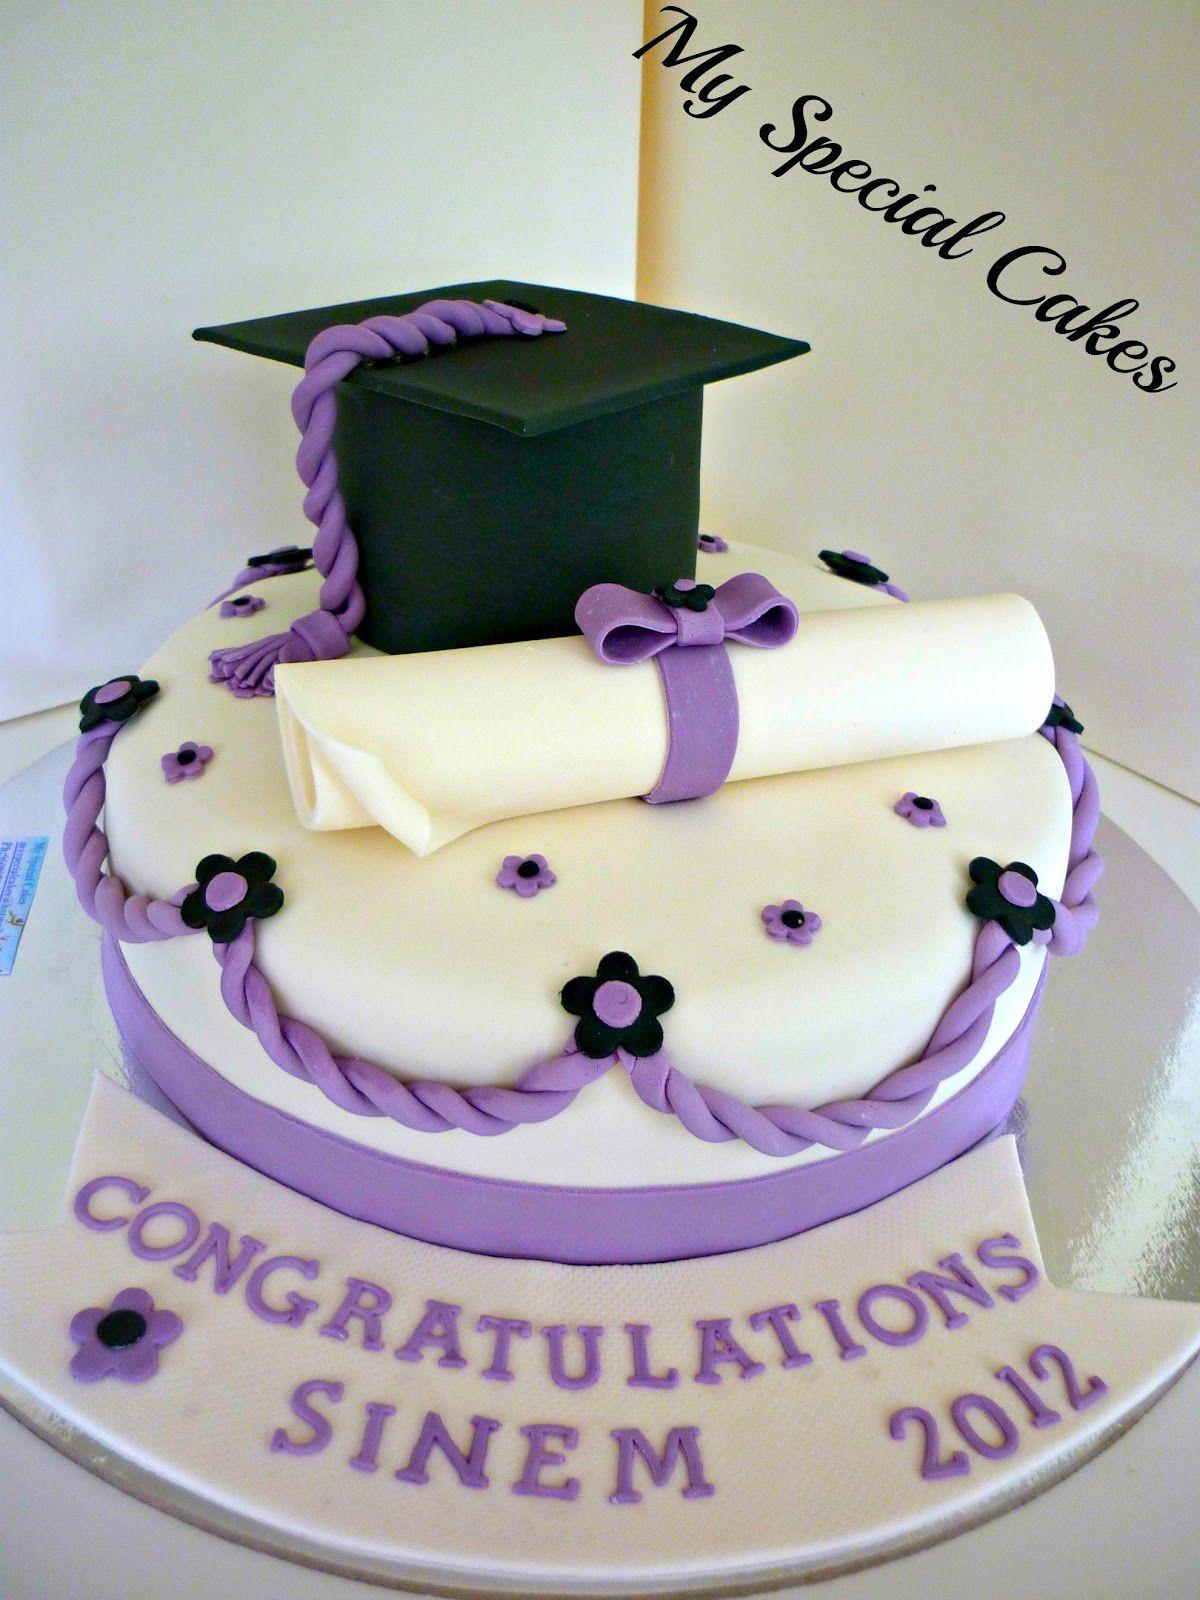 Diva Graduation Cakes Fcbdebbfbddfcebd